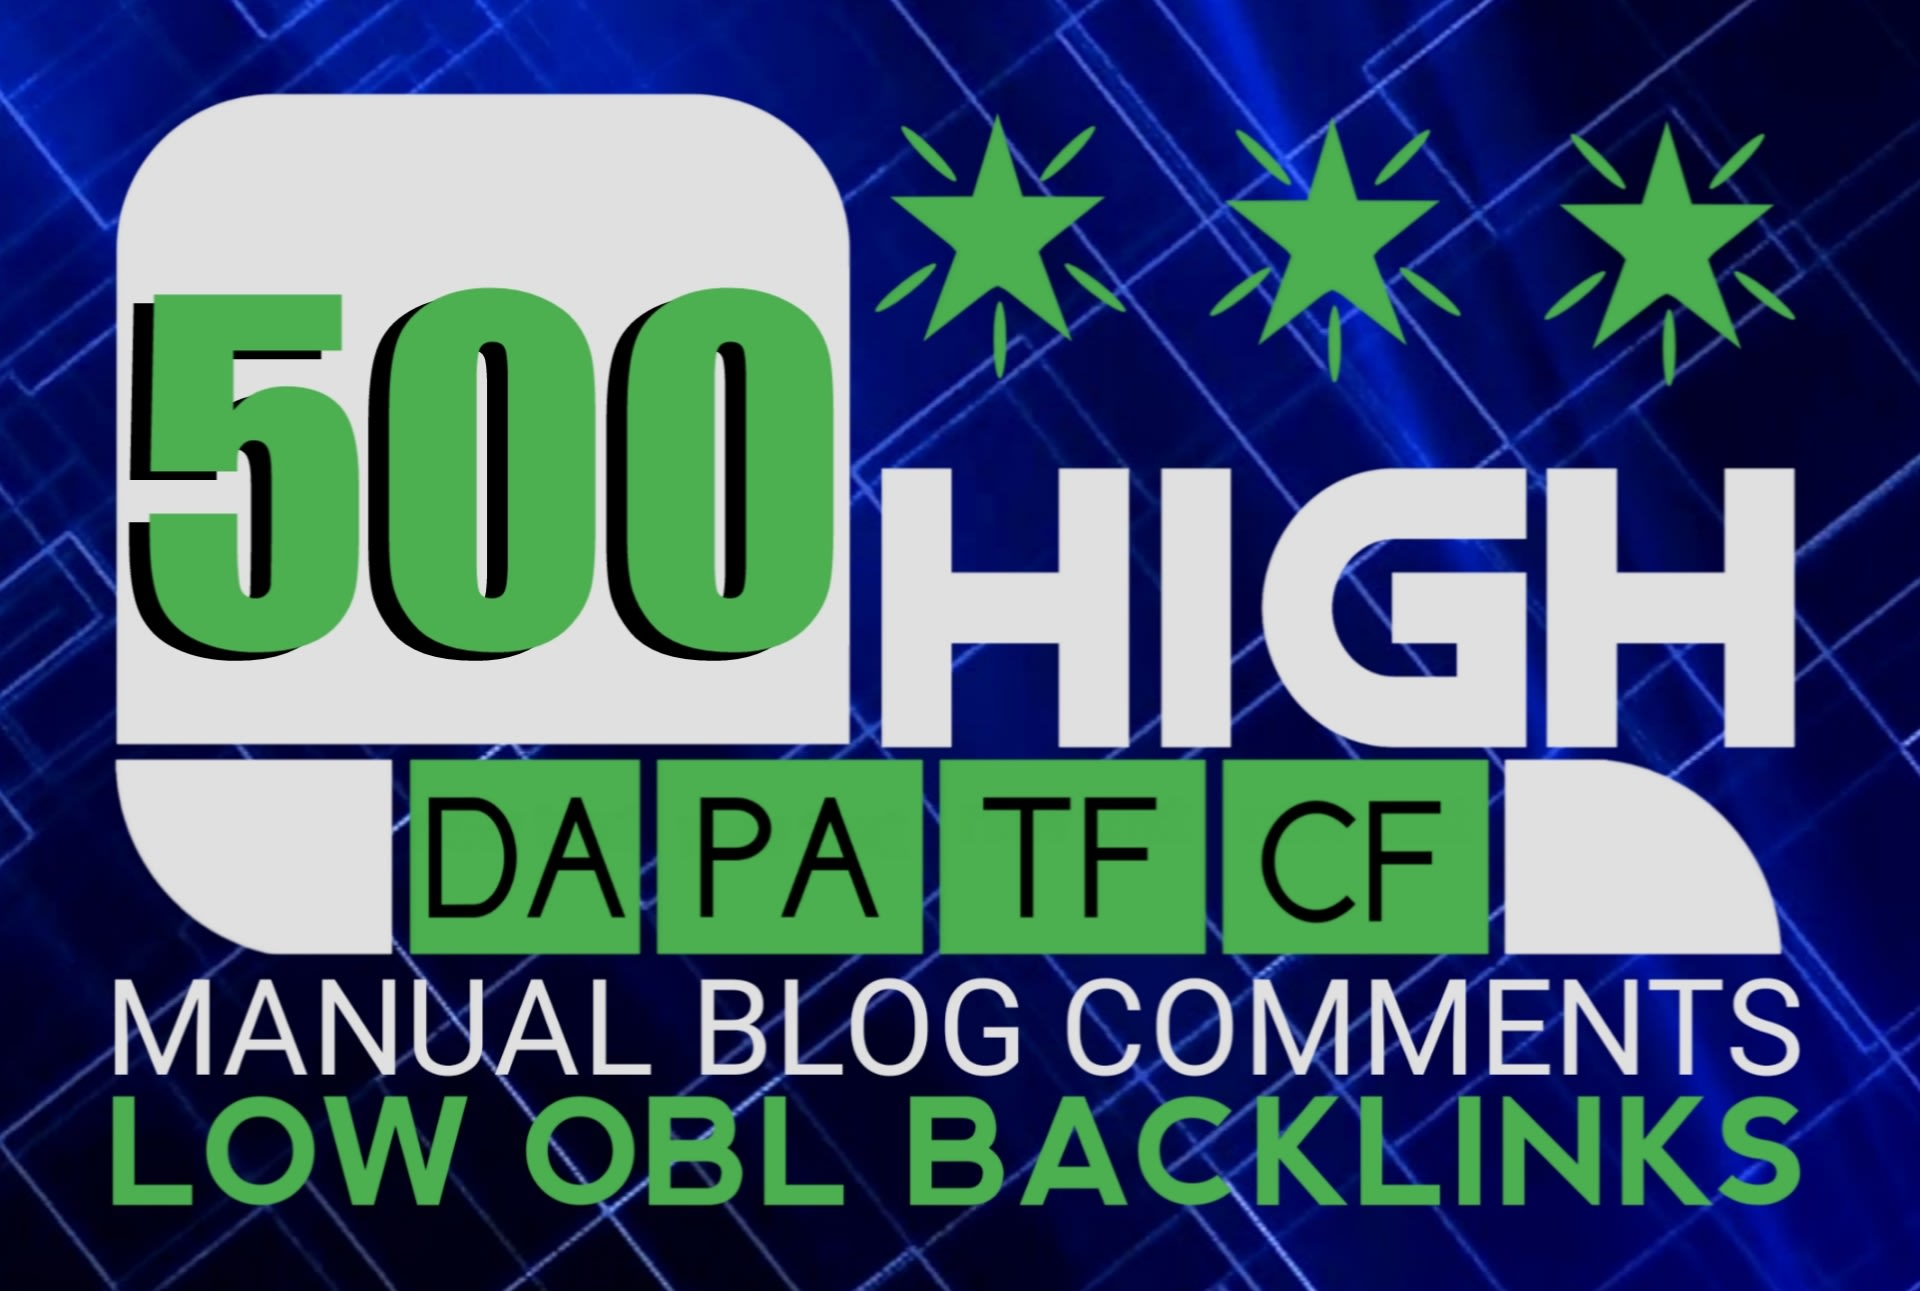 I will do 500 blog comment backlinks in high da pa